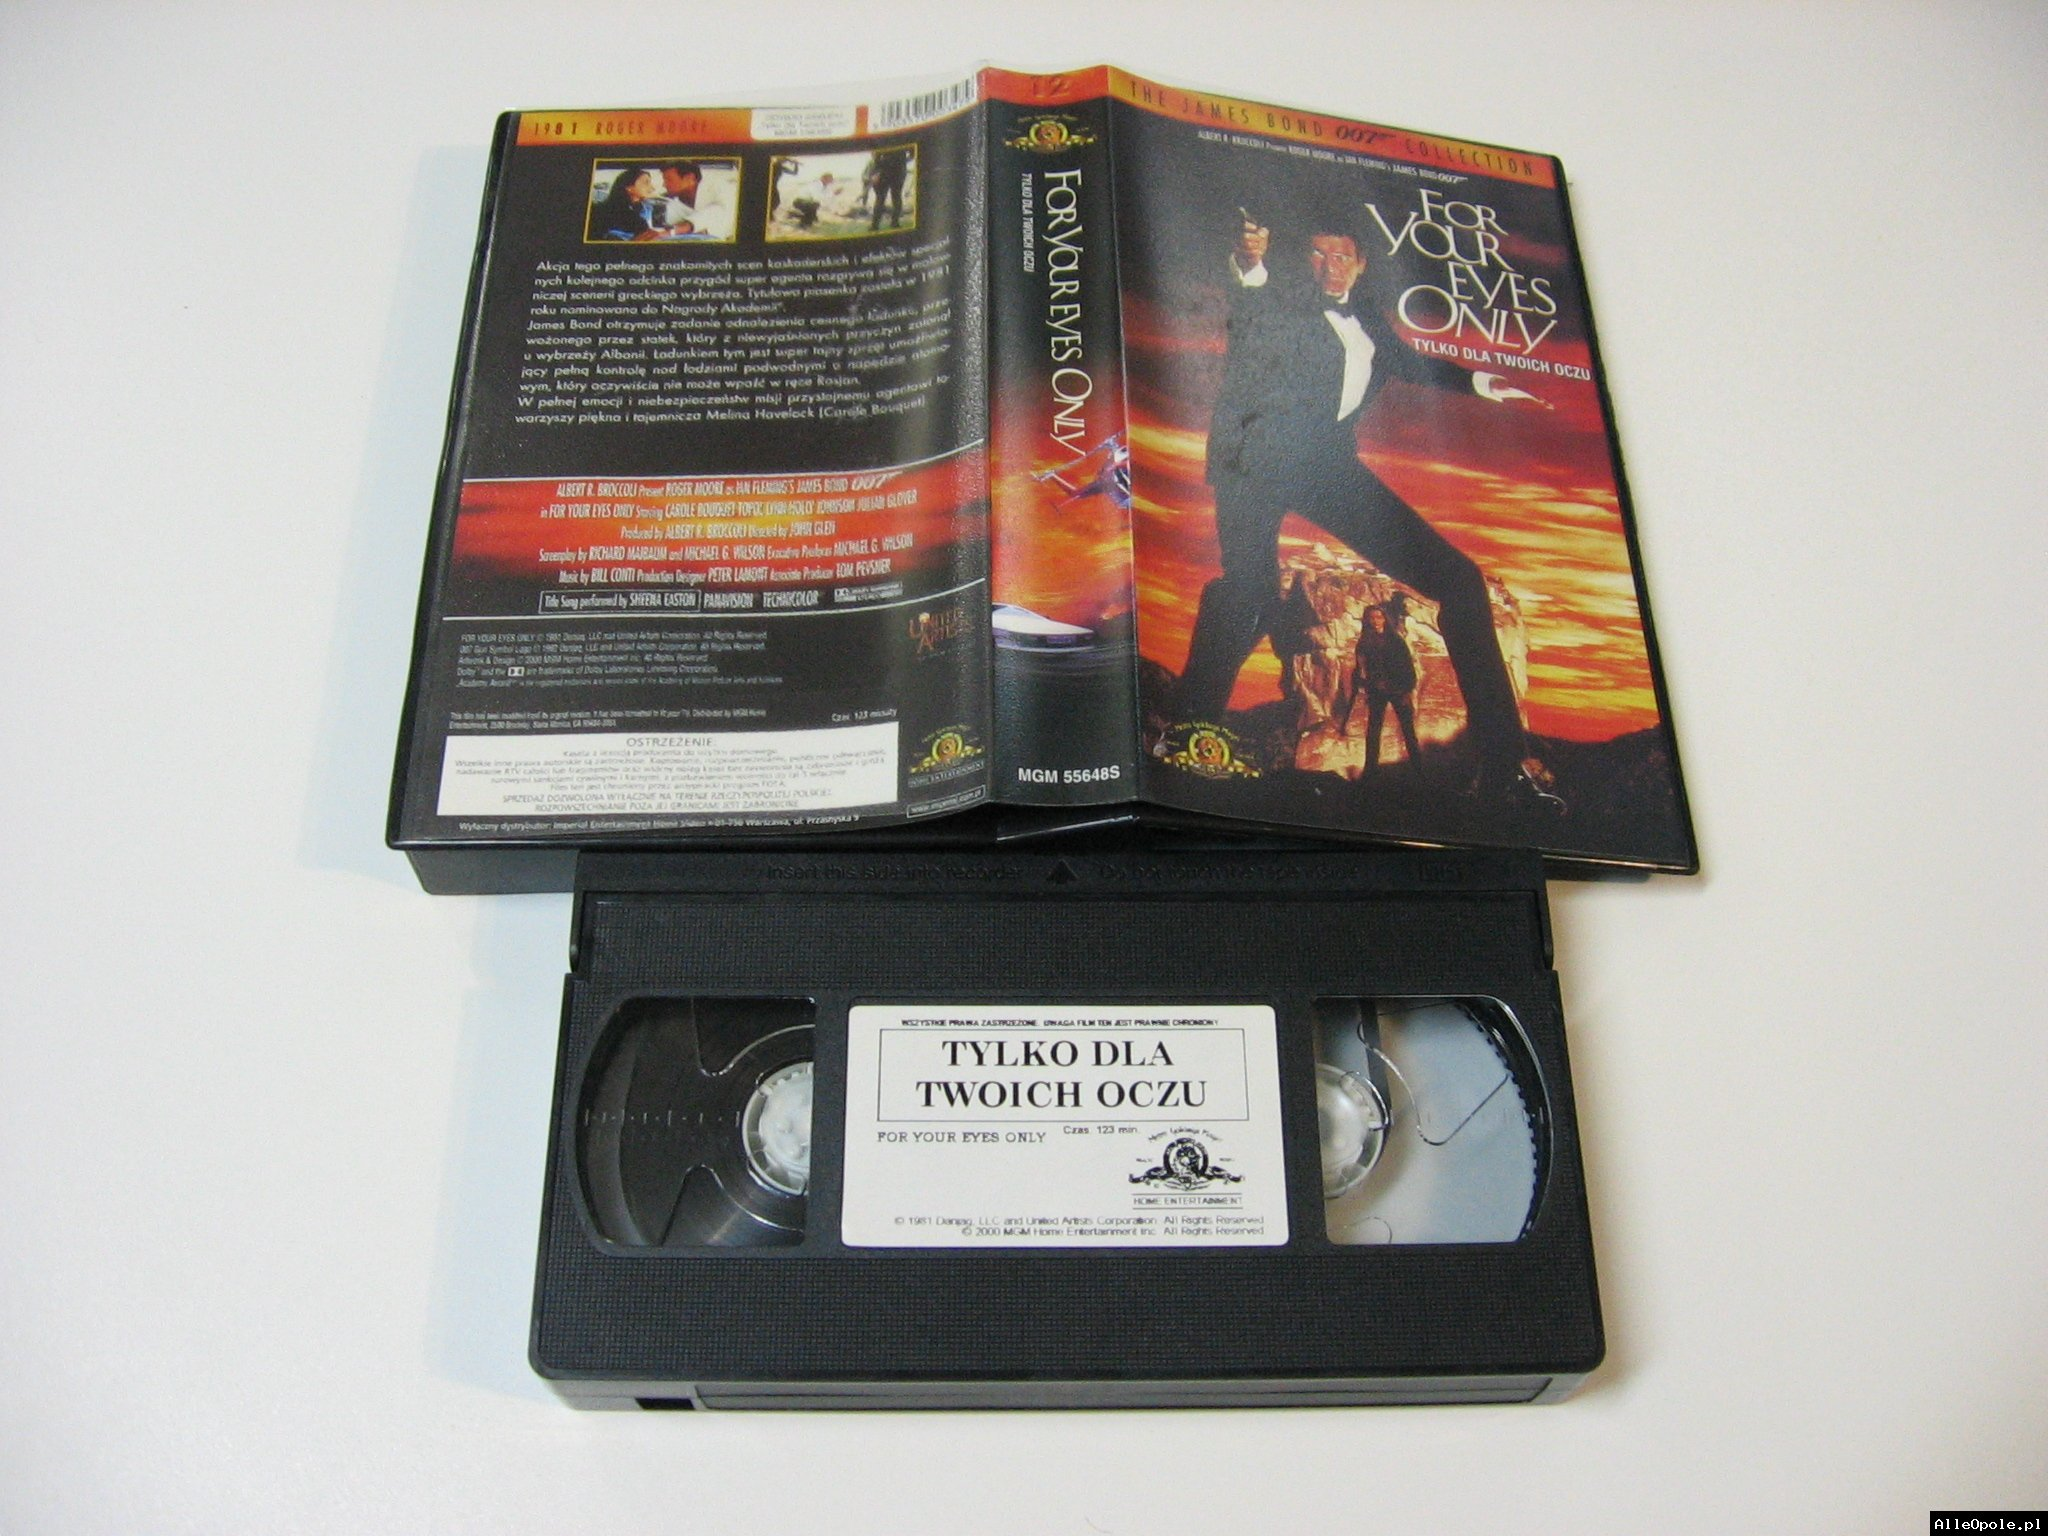 007 TYLKO DLA TWOICH OCZU - VHS Kaseta Video - Opole 1728